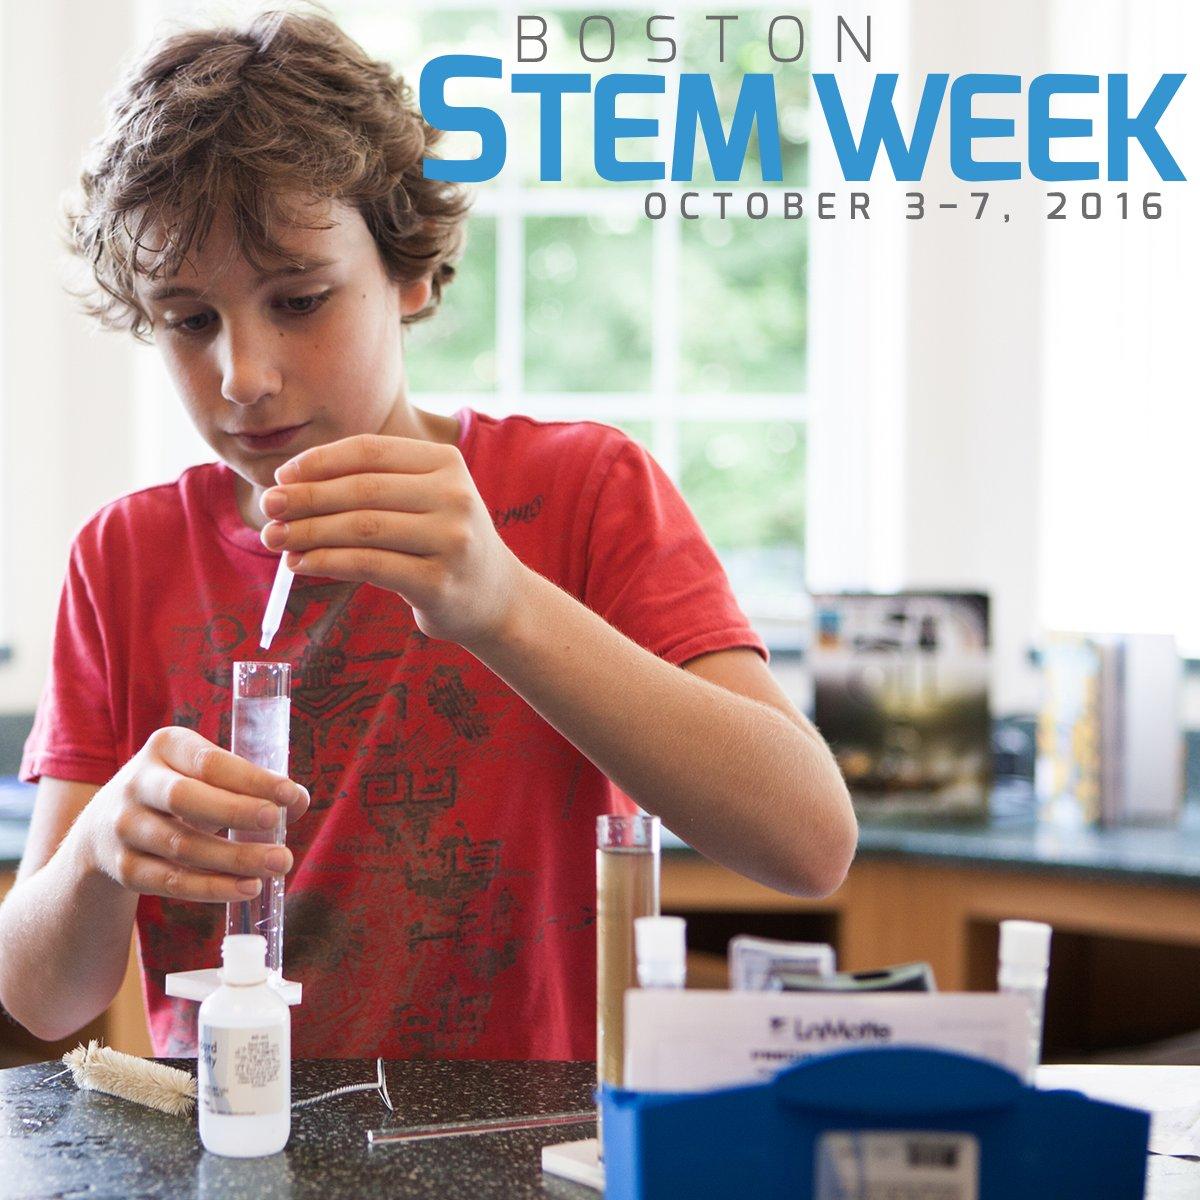 We're excited for #BostonSTEMWeek next week! 36 schools to participate in week-long immersive #STEM experience. https://t.co/gw77JwO18K